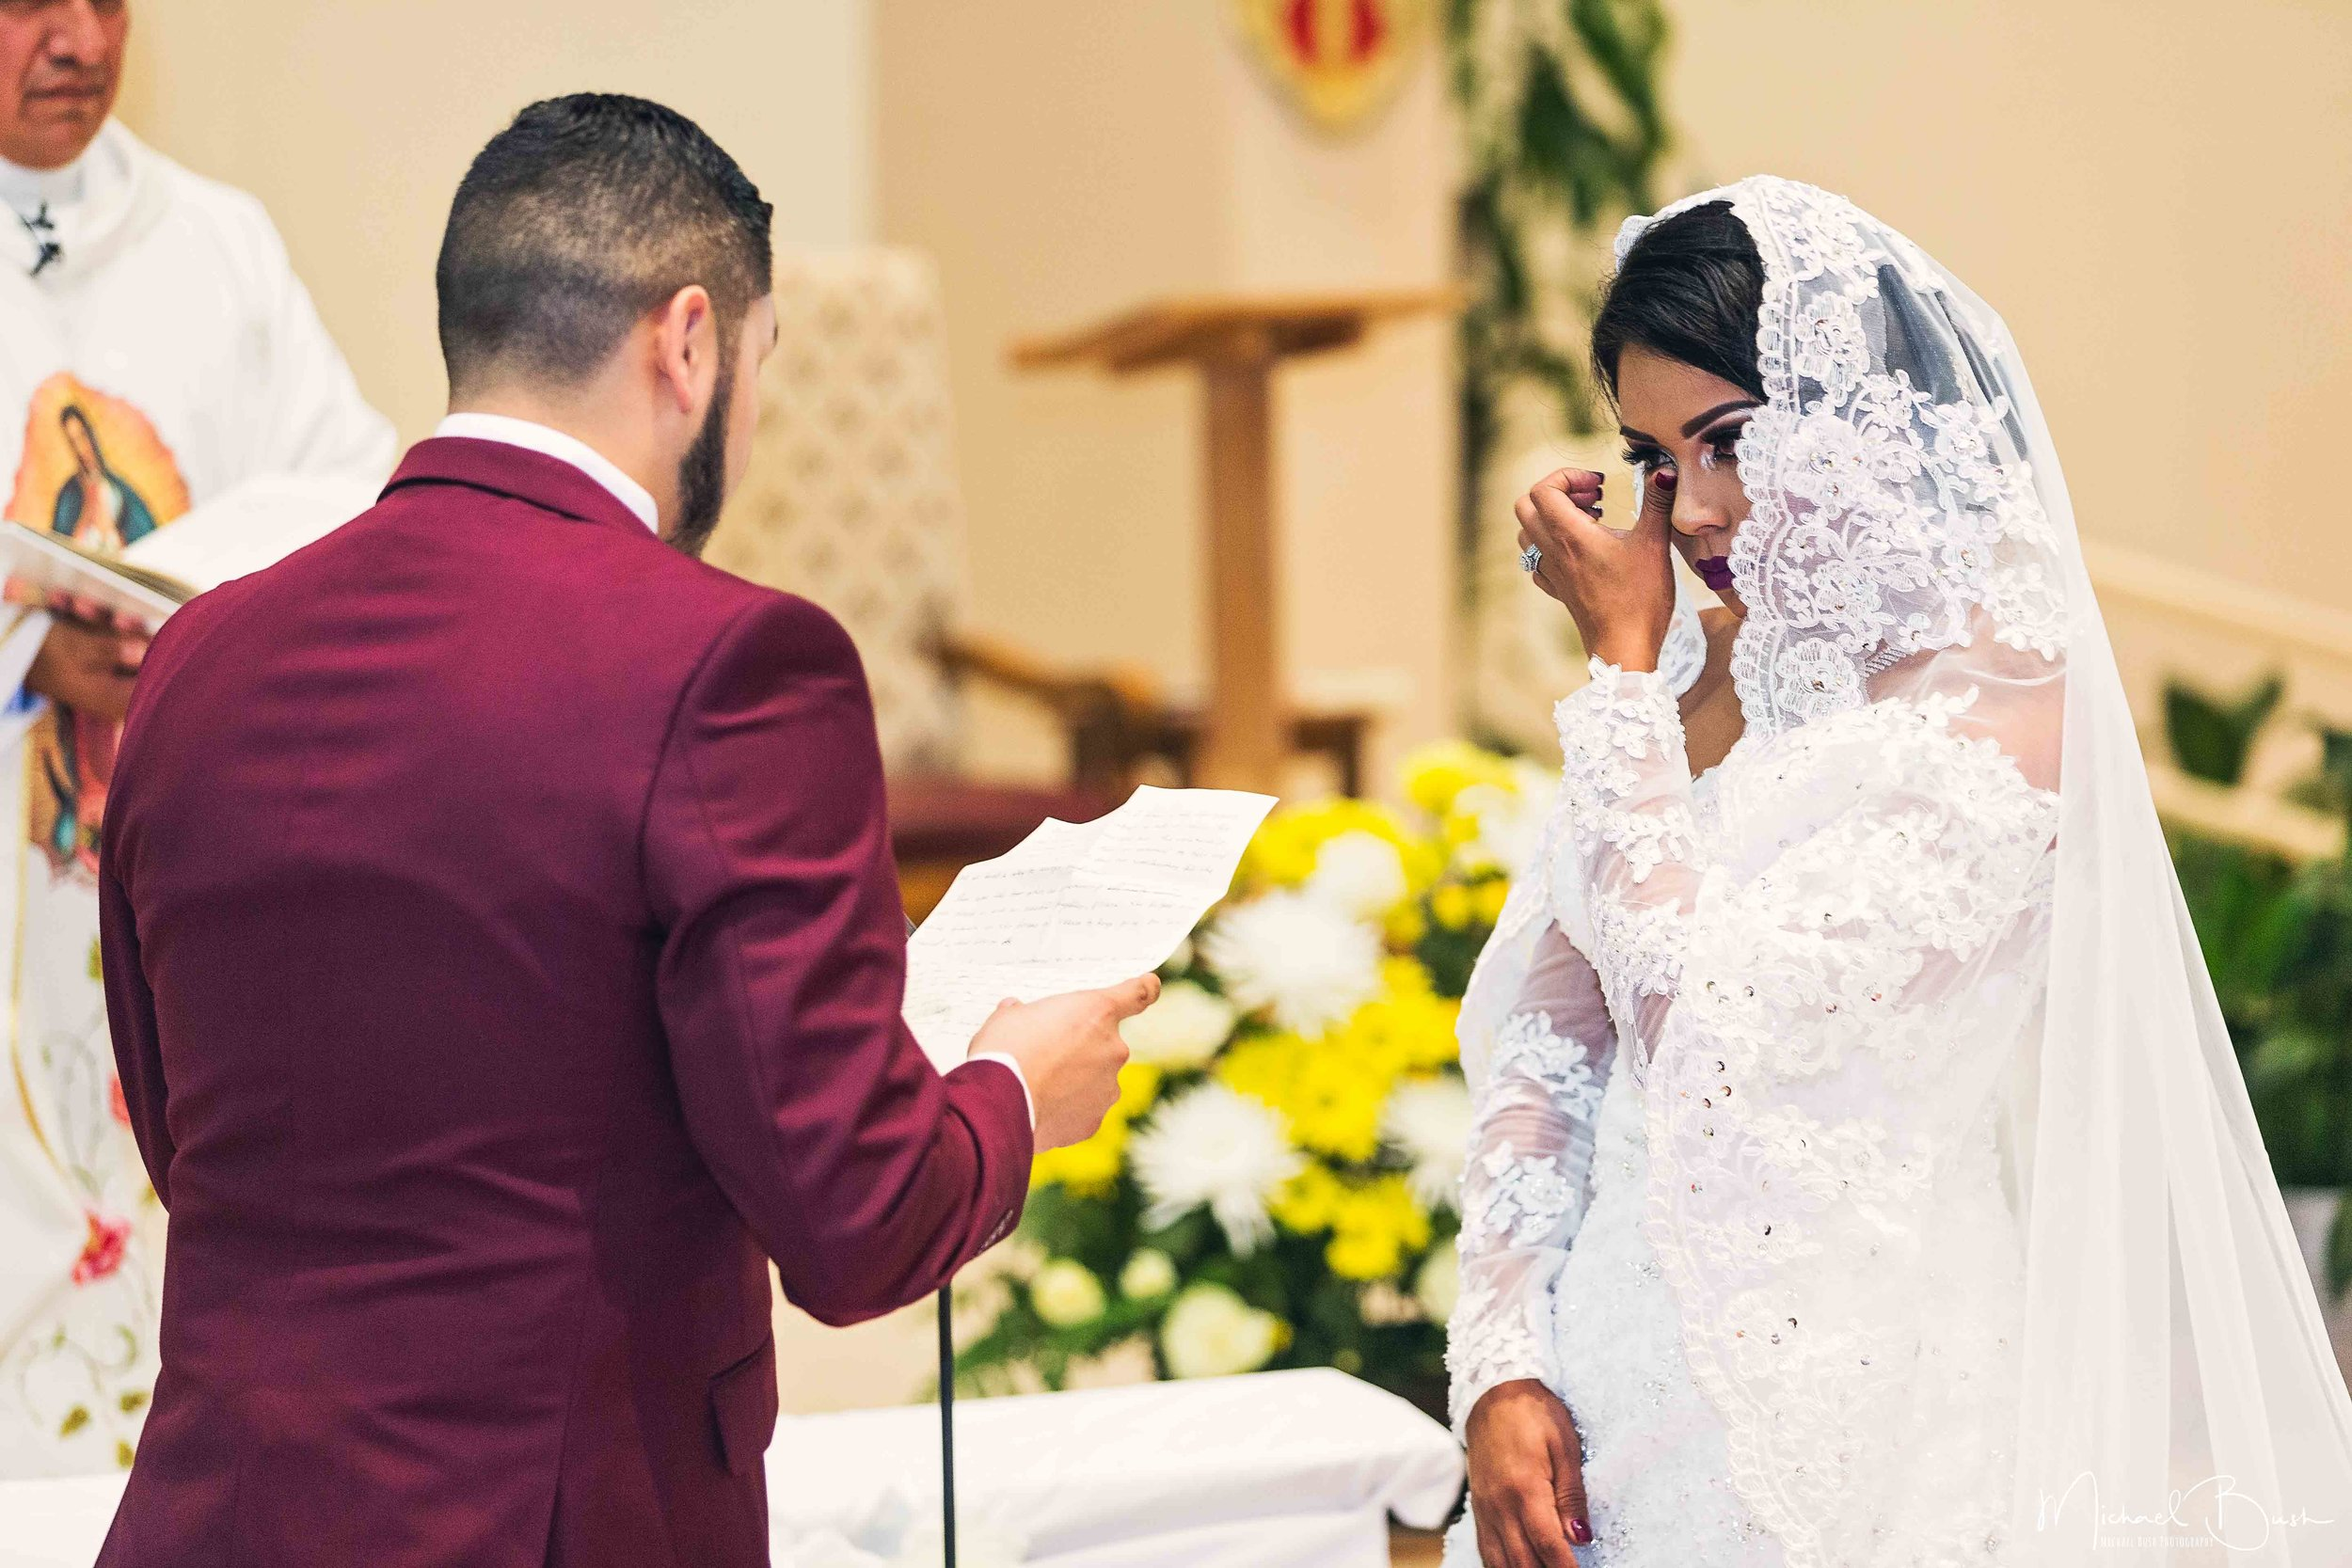 Wedding-Details-Bride-Fort Worth-colors-Ceremony-weddingceremony-brides-groom-ido-church-wedding vowels.jpg